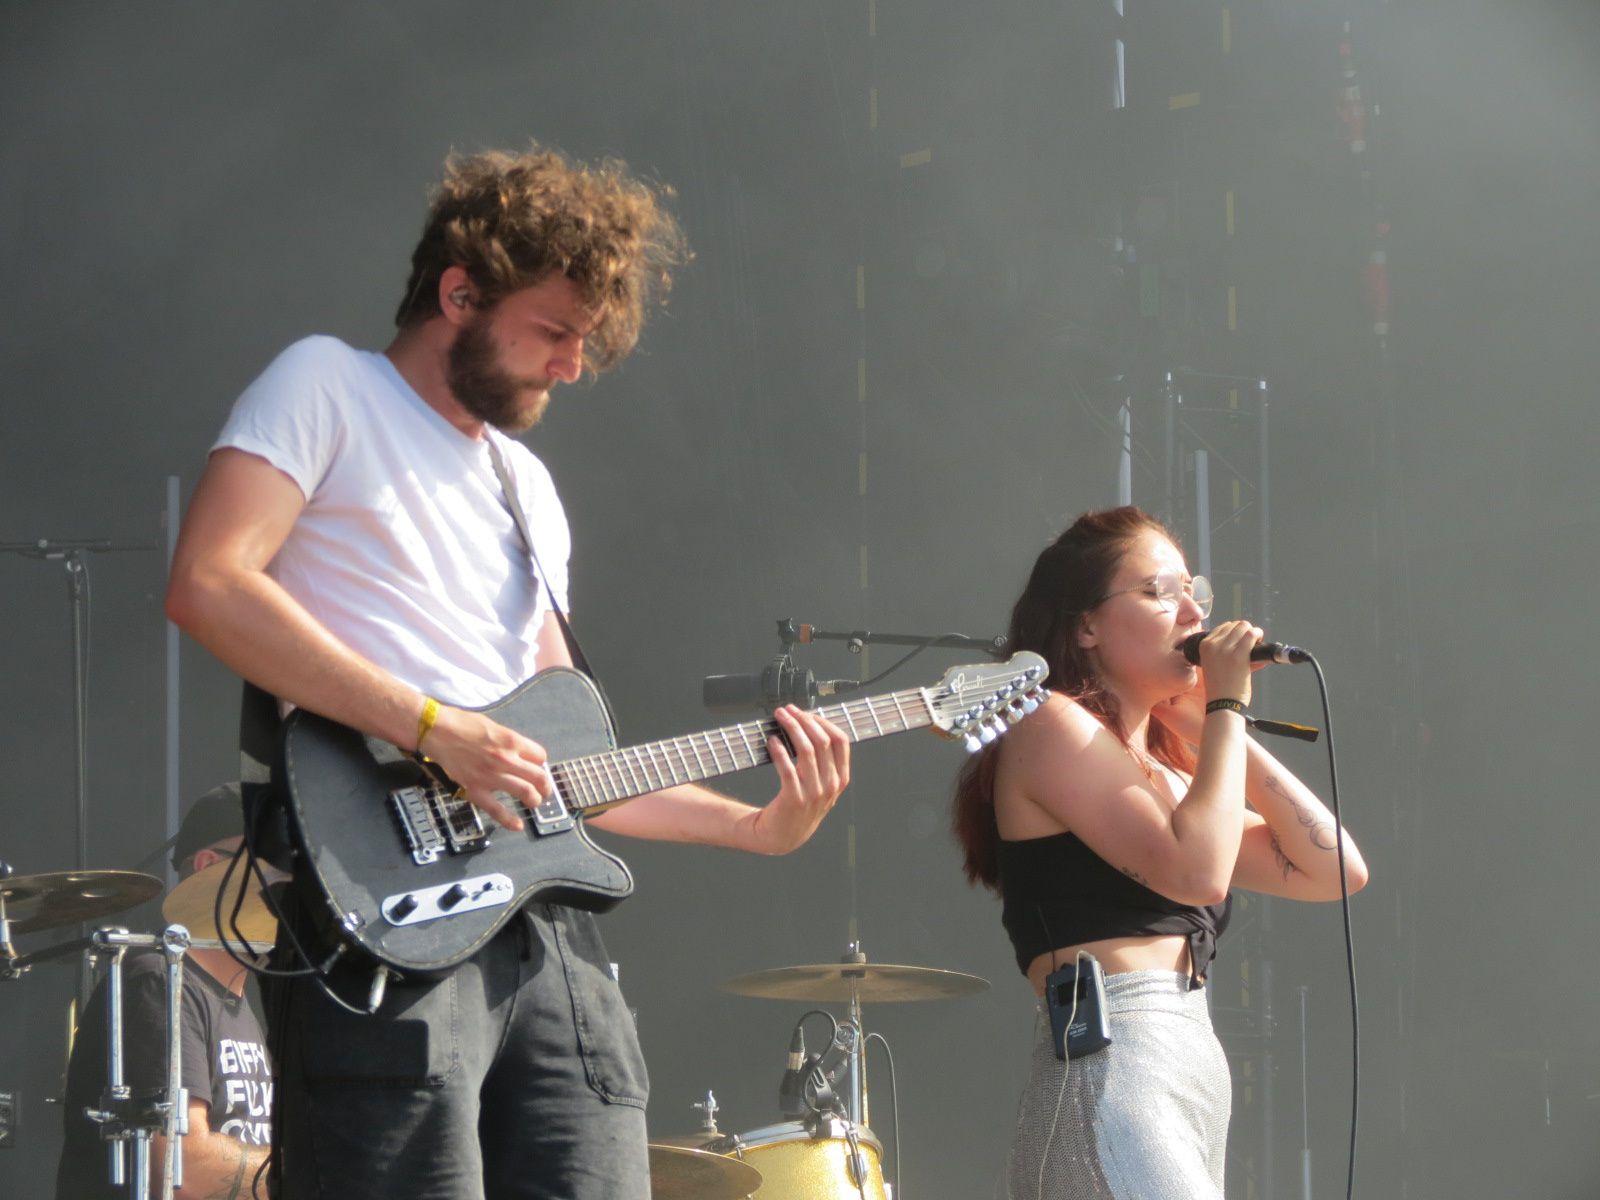 Renaud et Juliette (crédit photo coline lefevre @colinelfvre)